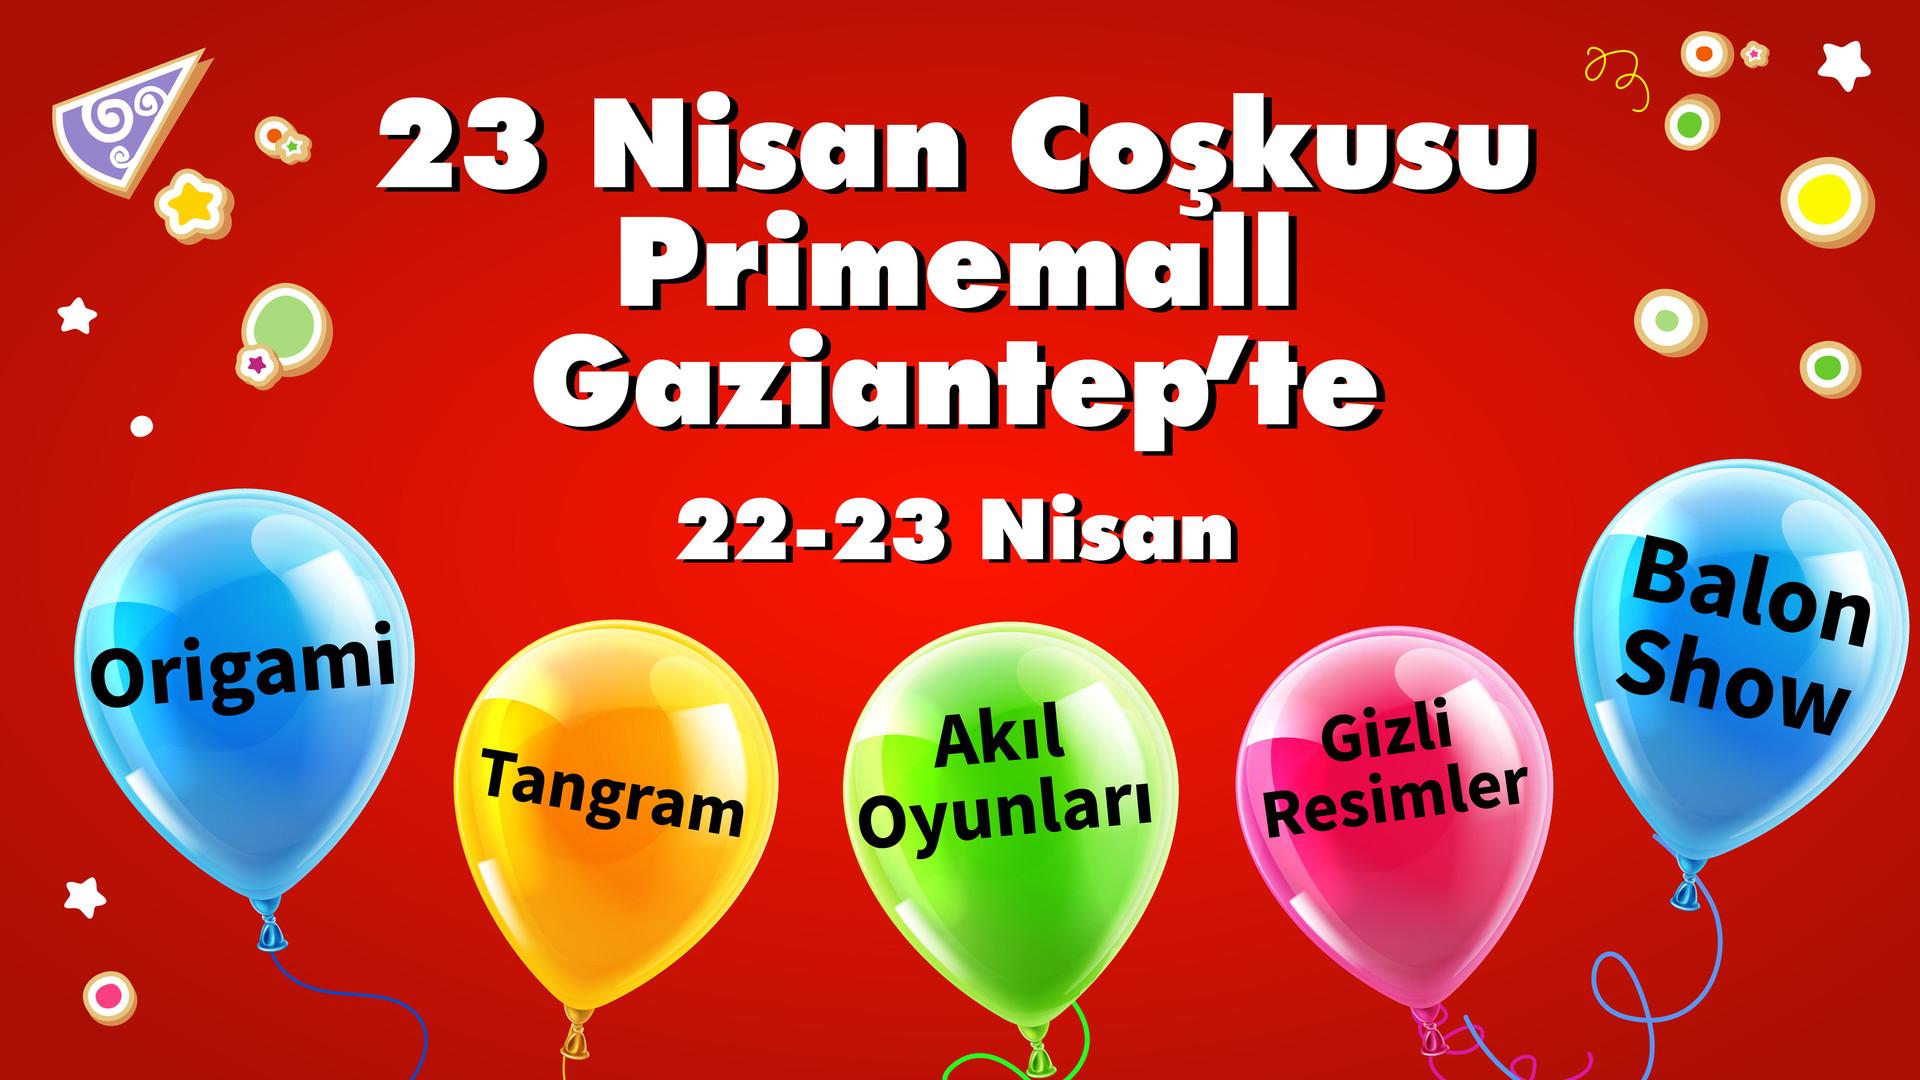 23 Nisan coşkusu Primemall Gaziantep'te